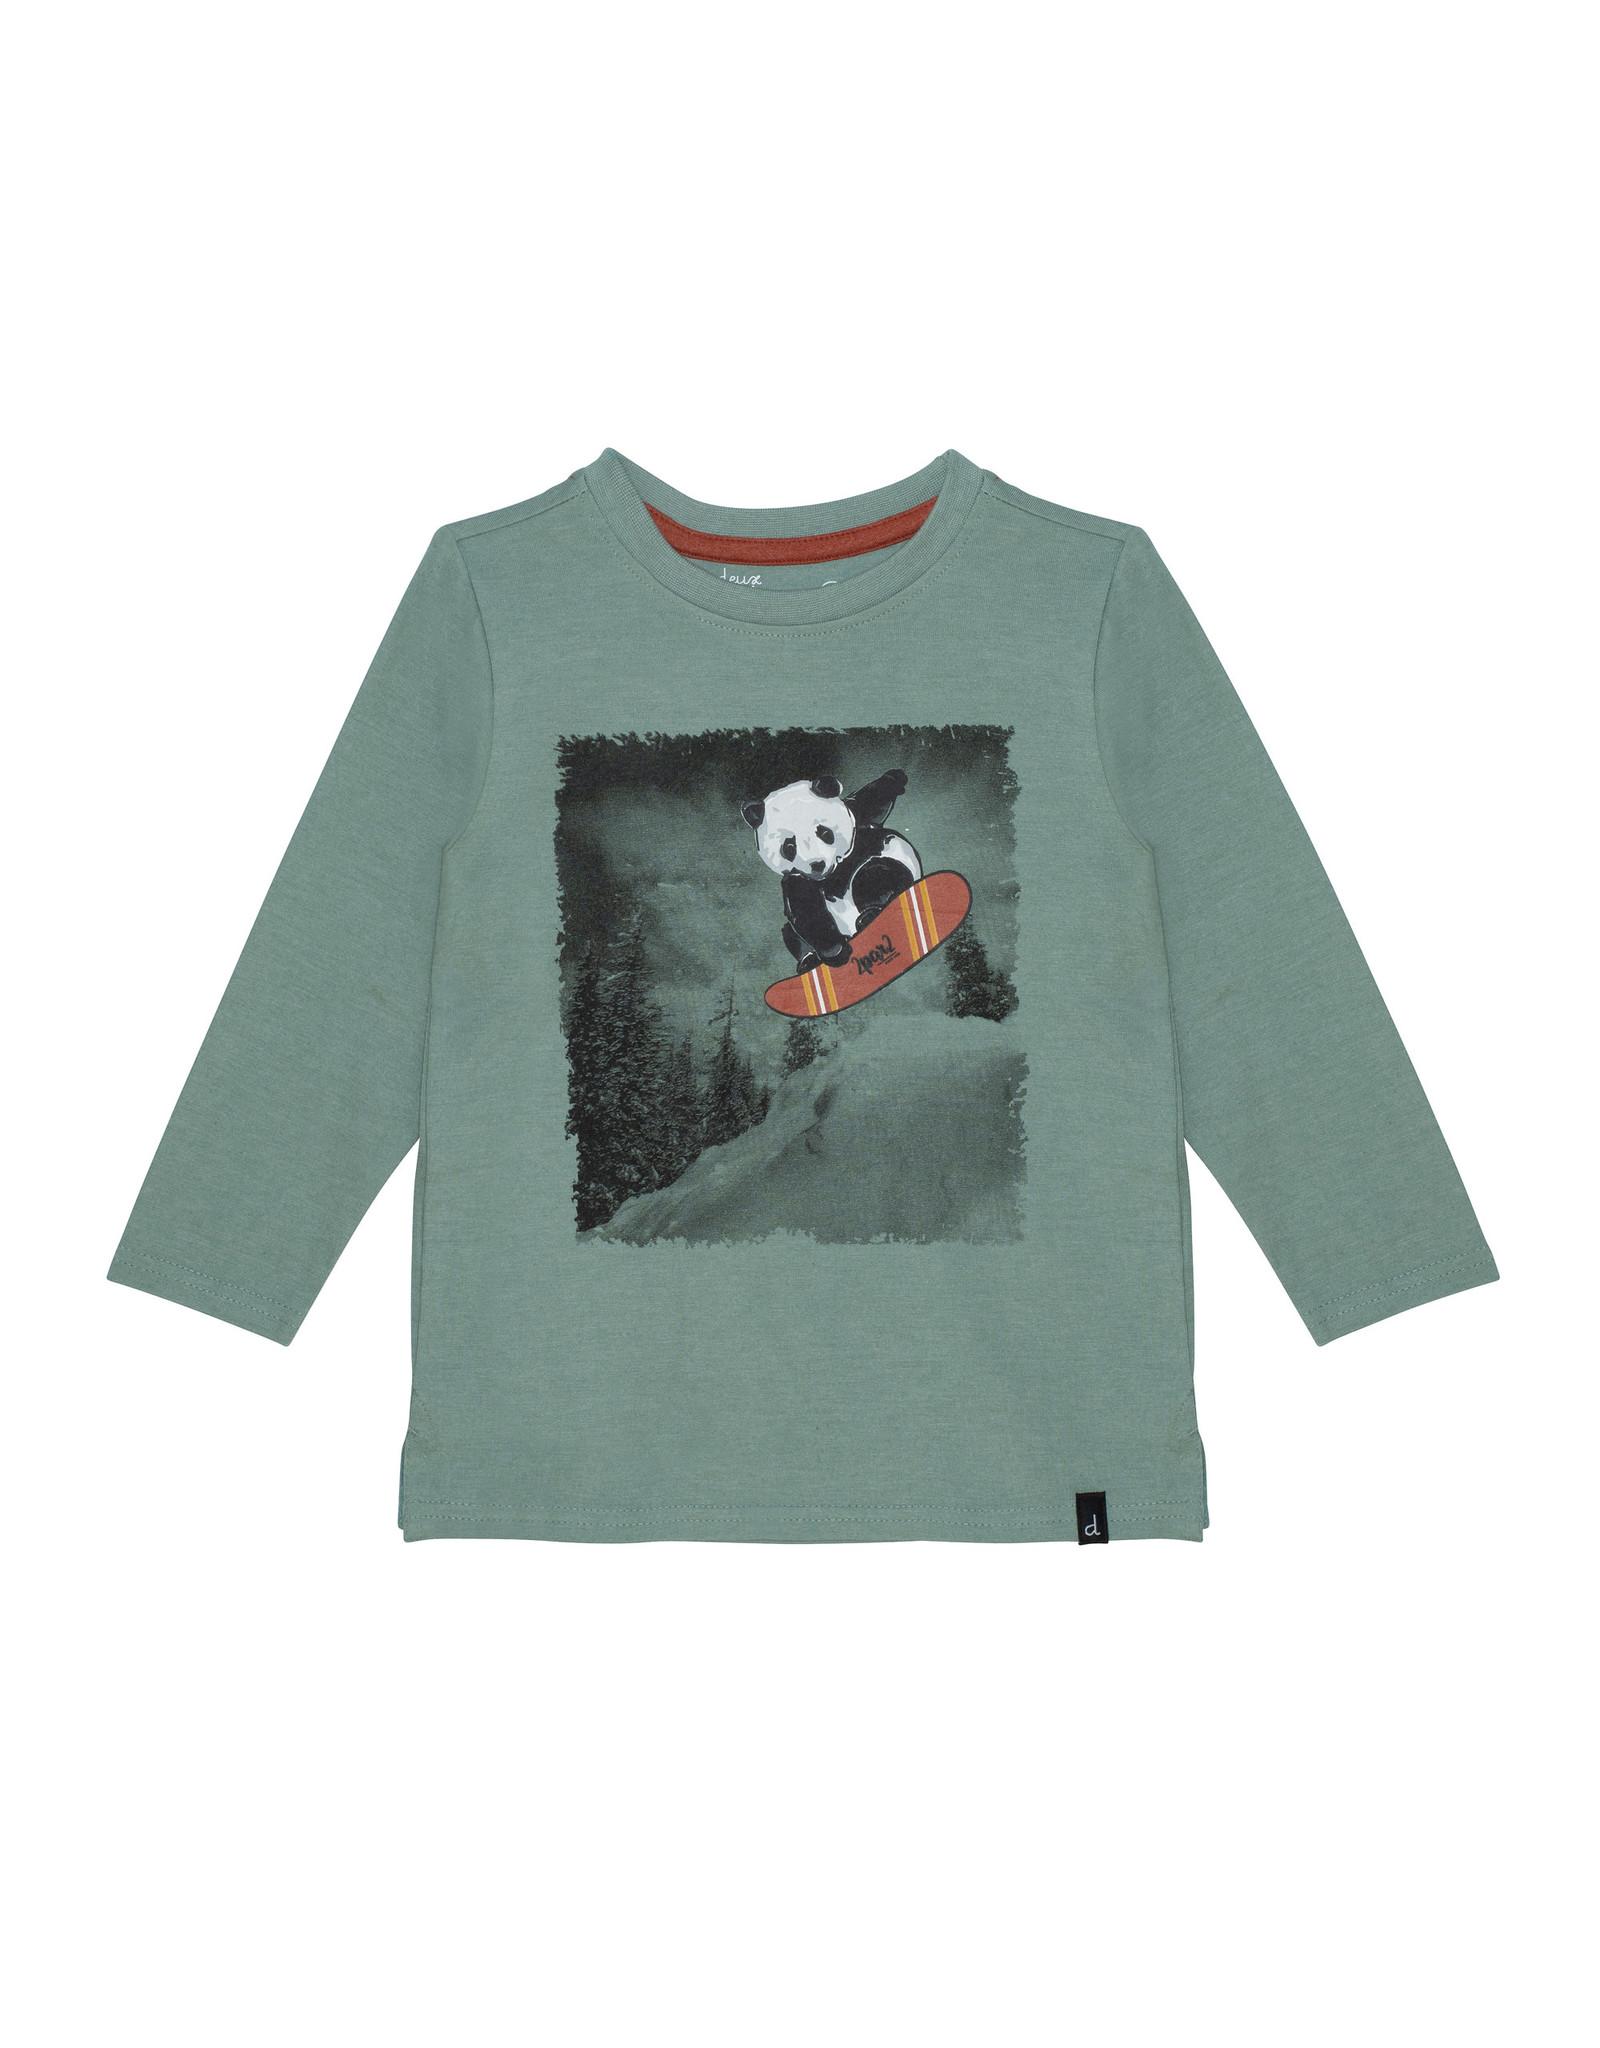 Deux Par Deux Green Snowboarding Panda Shirt